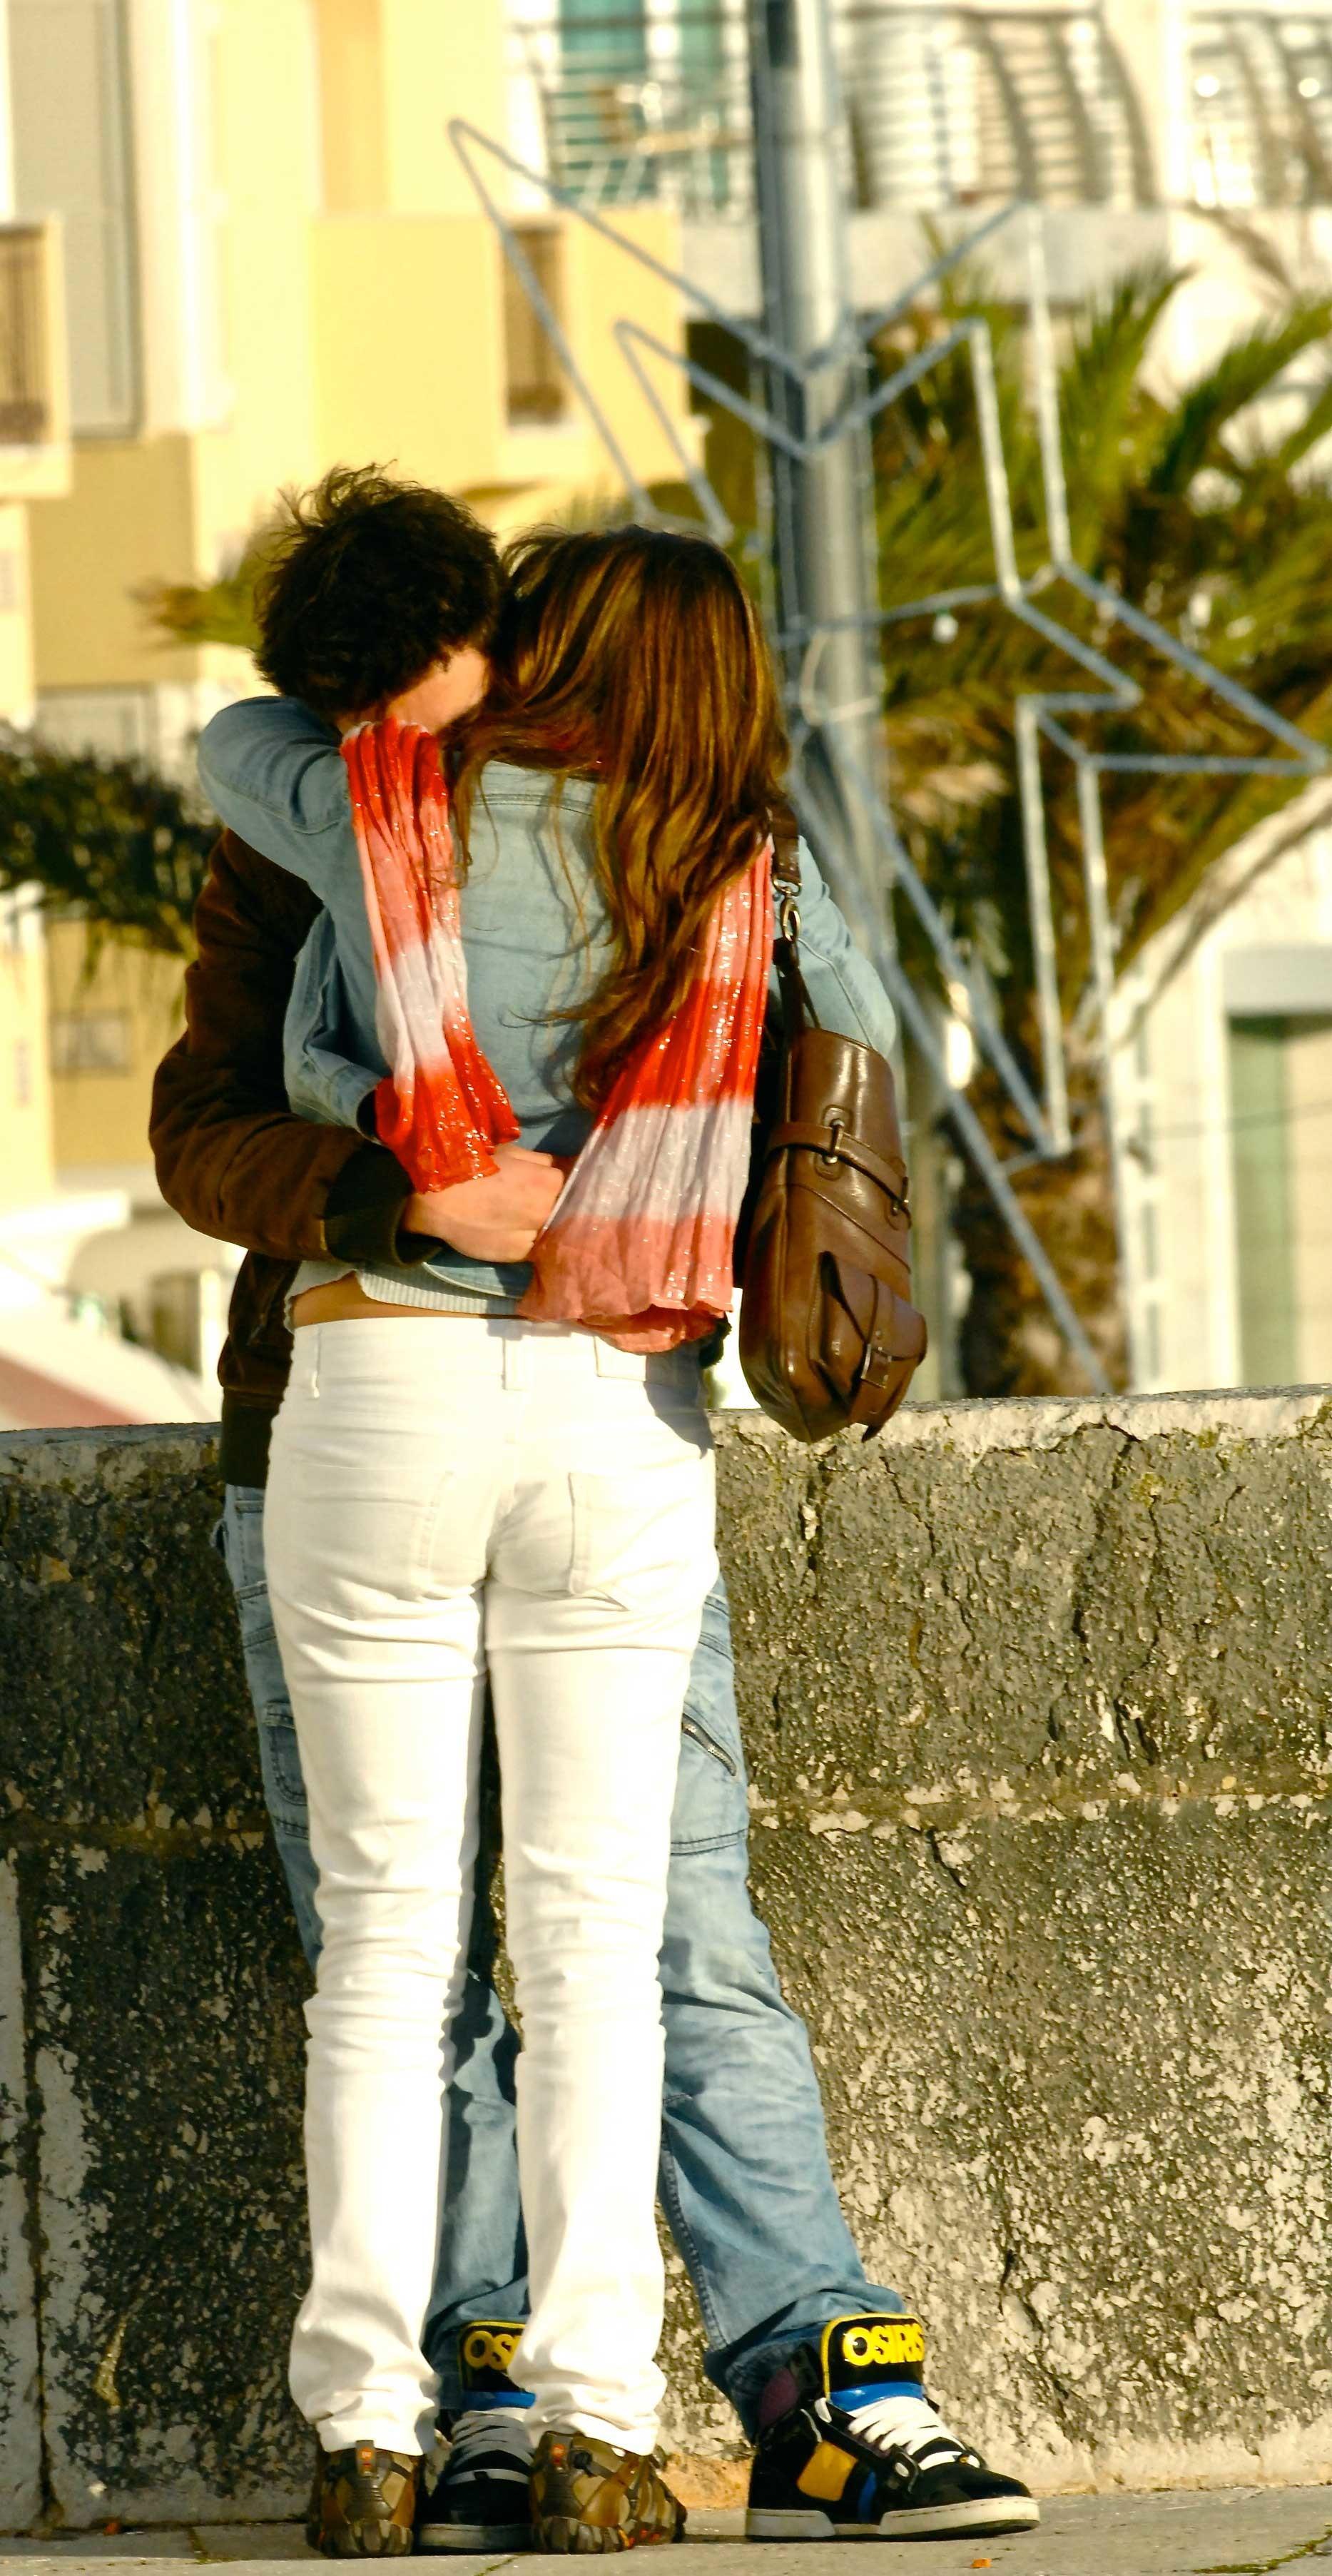 kissing pictures romantic couples